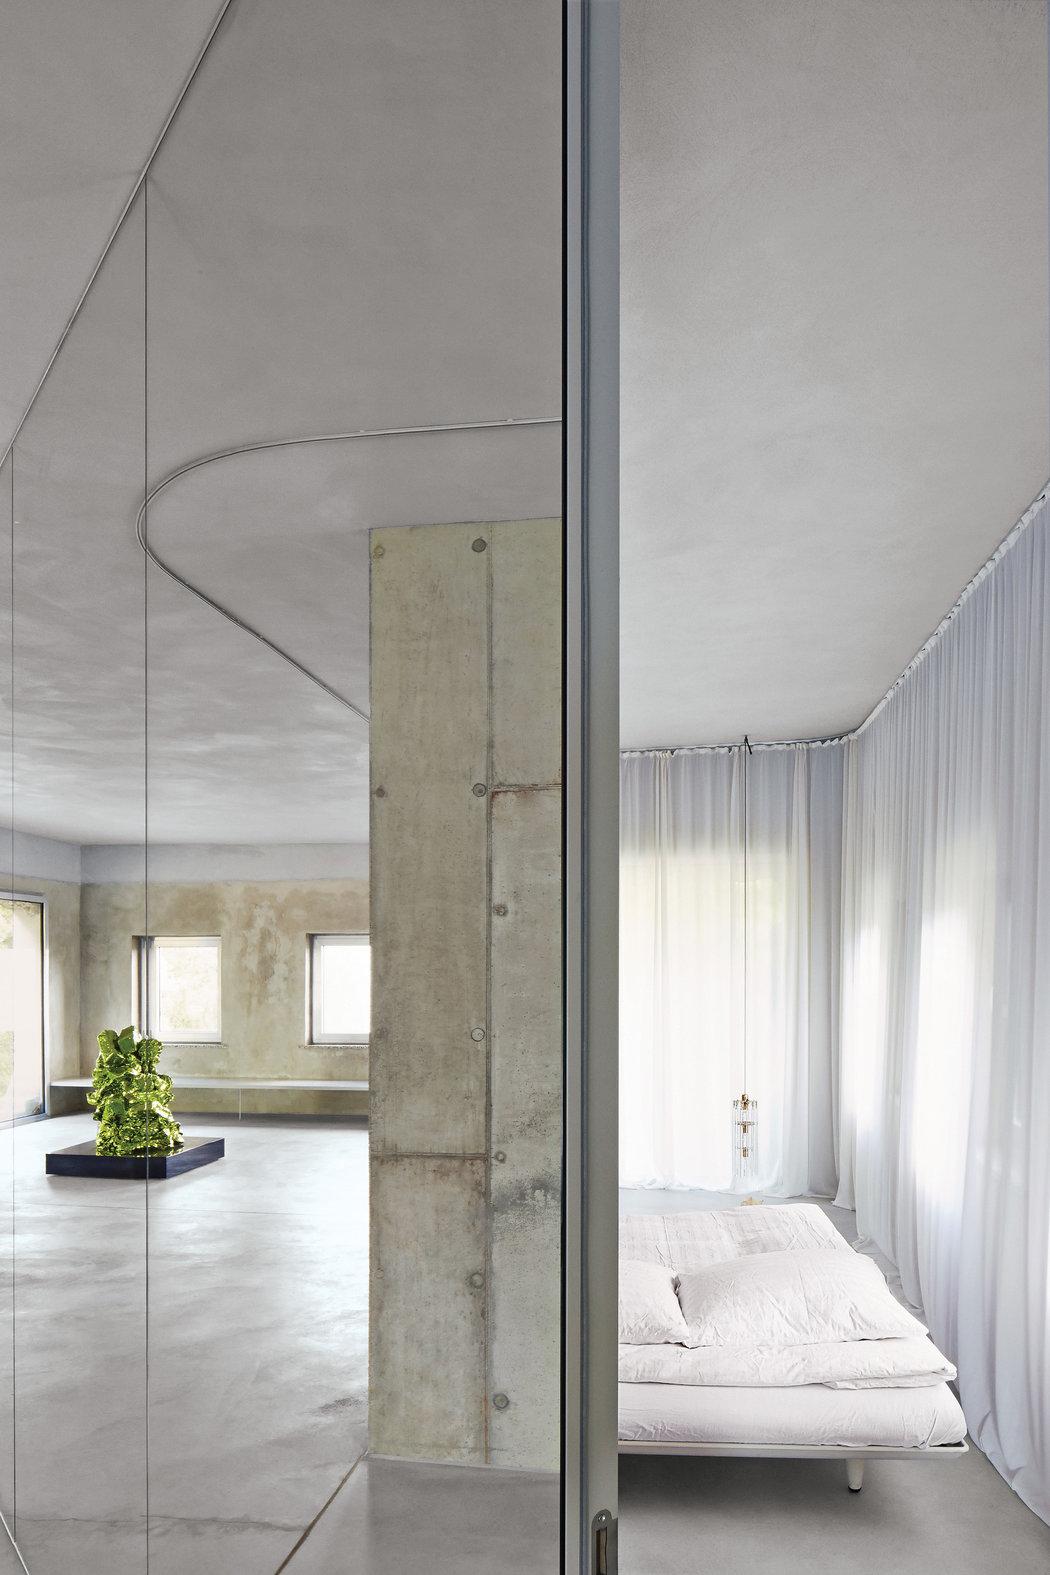 brutalist-architecture-slide-0ZPU-master1050.jpg